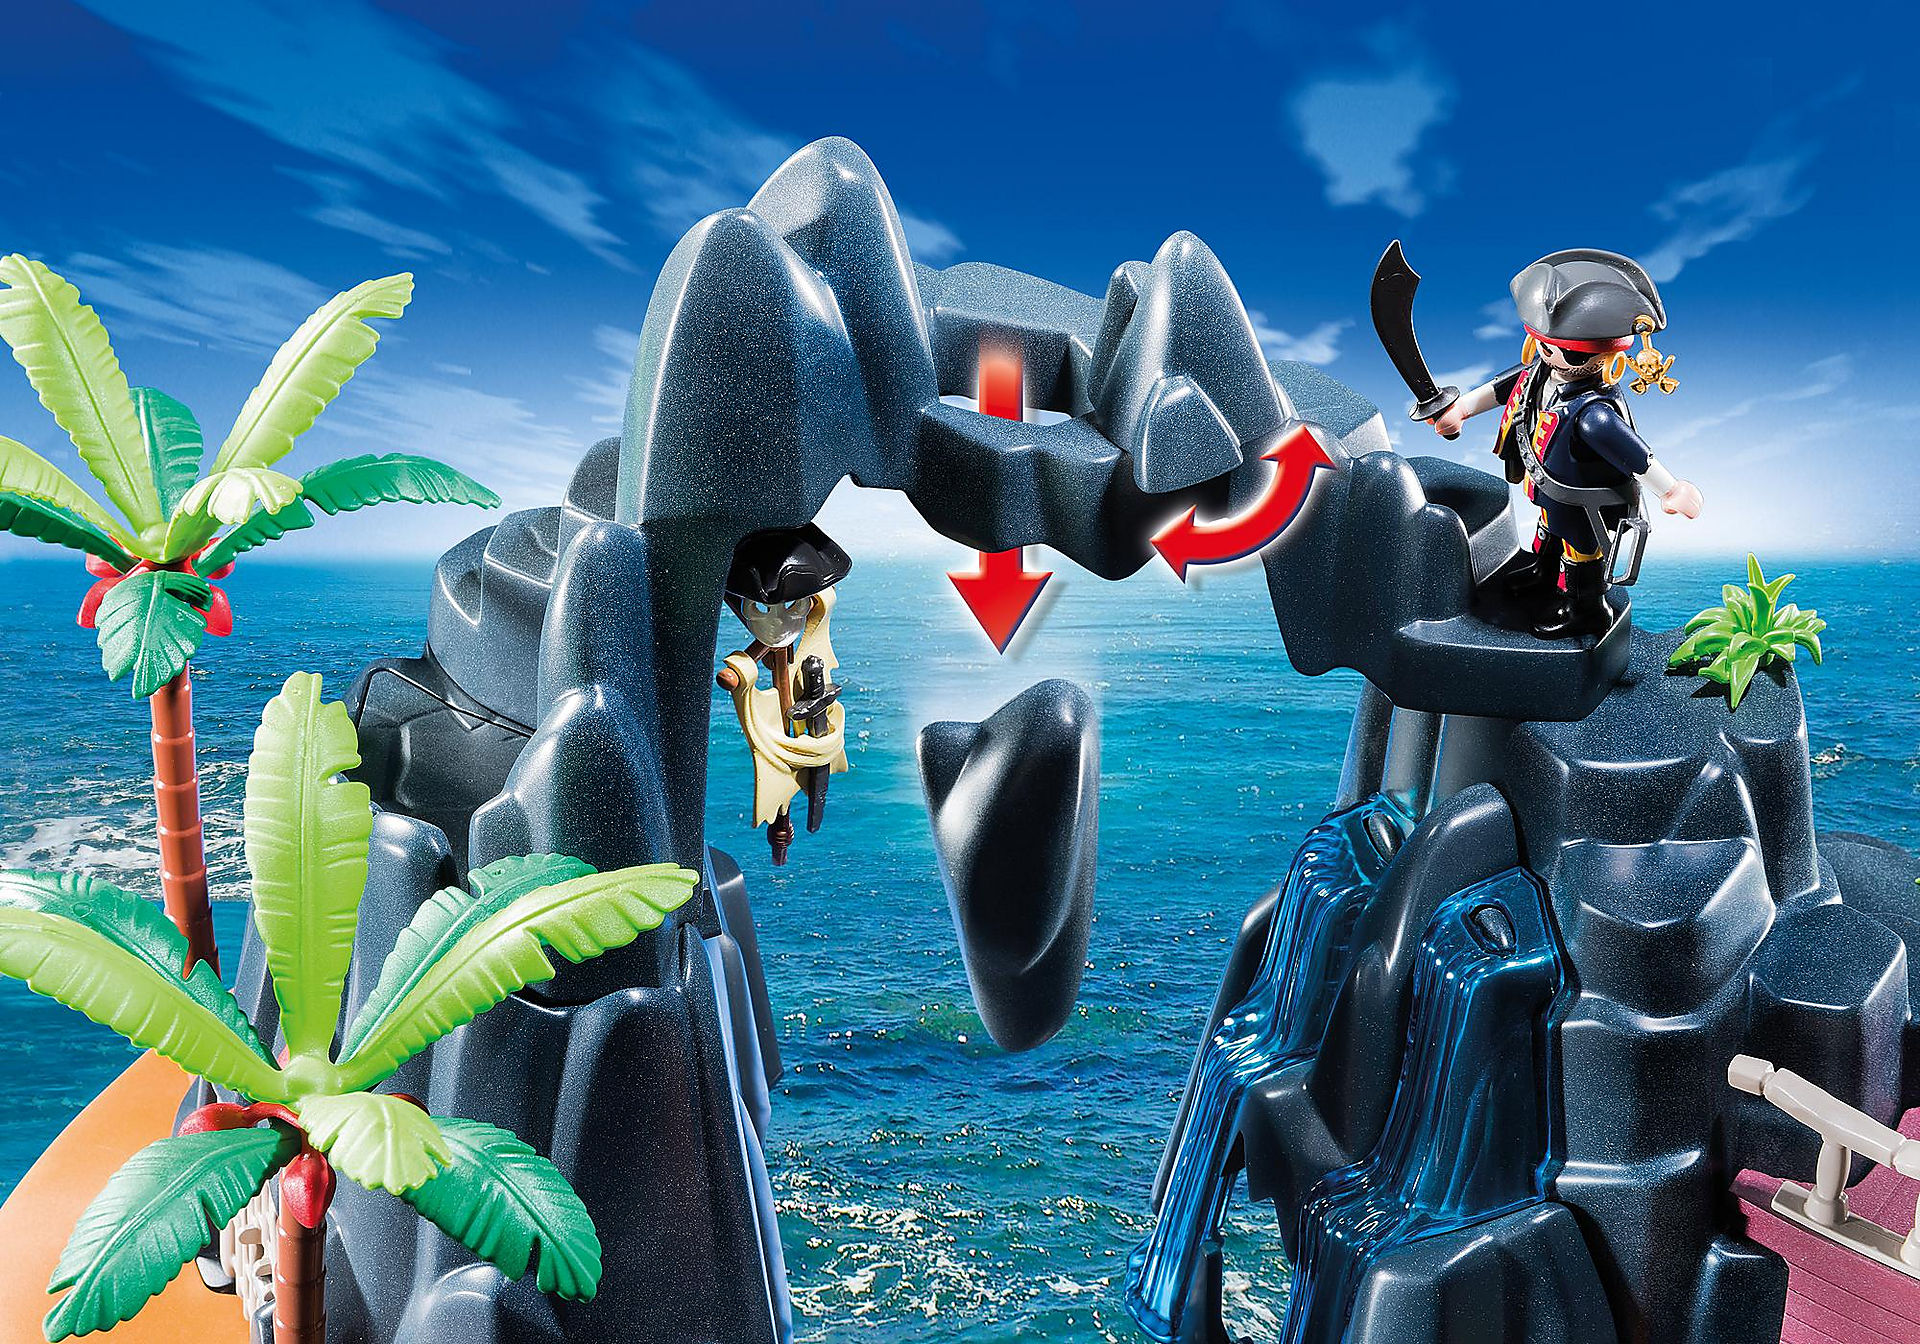 http://media.playmobil.com/i/playmobil/6679_product_extra5/Pirate Treasure Island